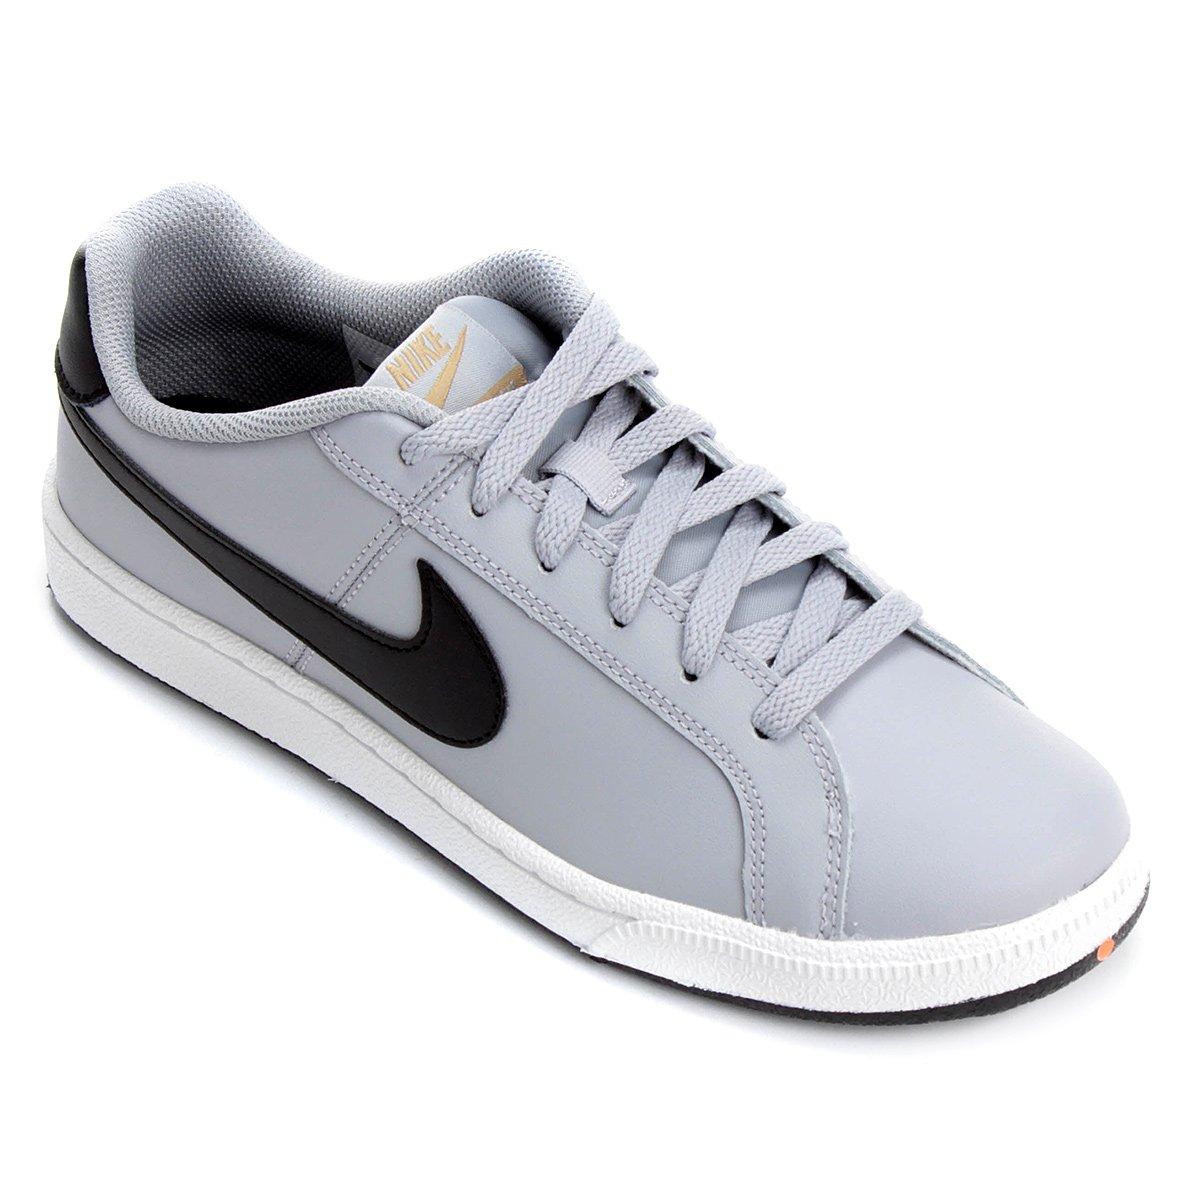 1a31f398c1 Tênis Couro Nike Court Royale Masculino - Cinza - Compre Agora